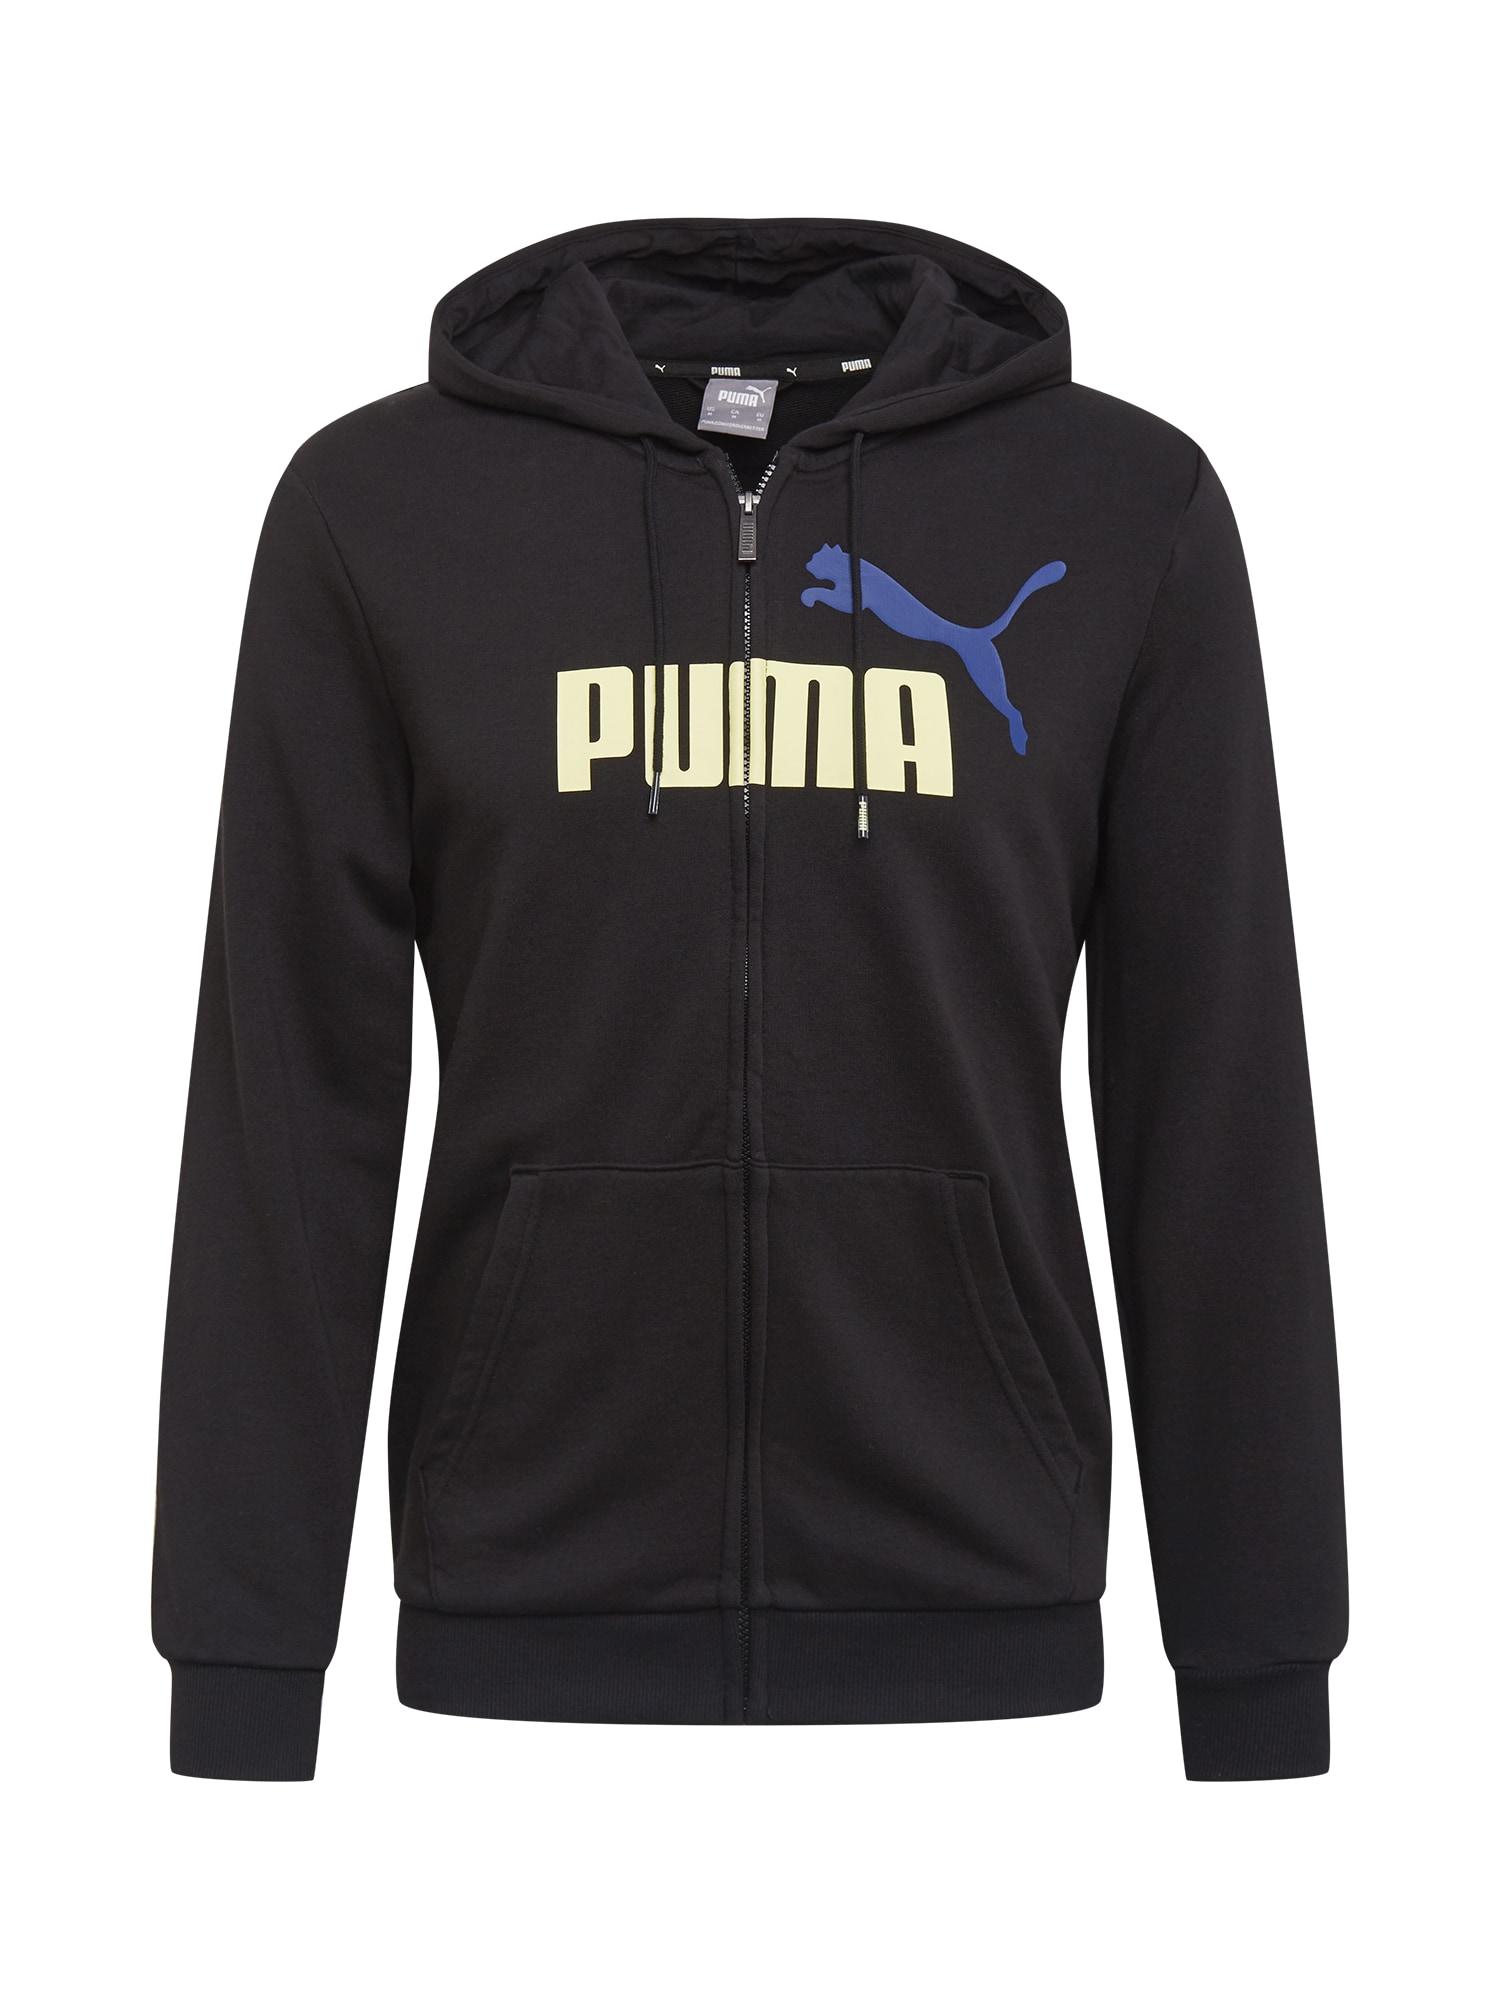 PUMA Sportinis džemperis juoda / balta / mėlyna